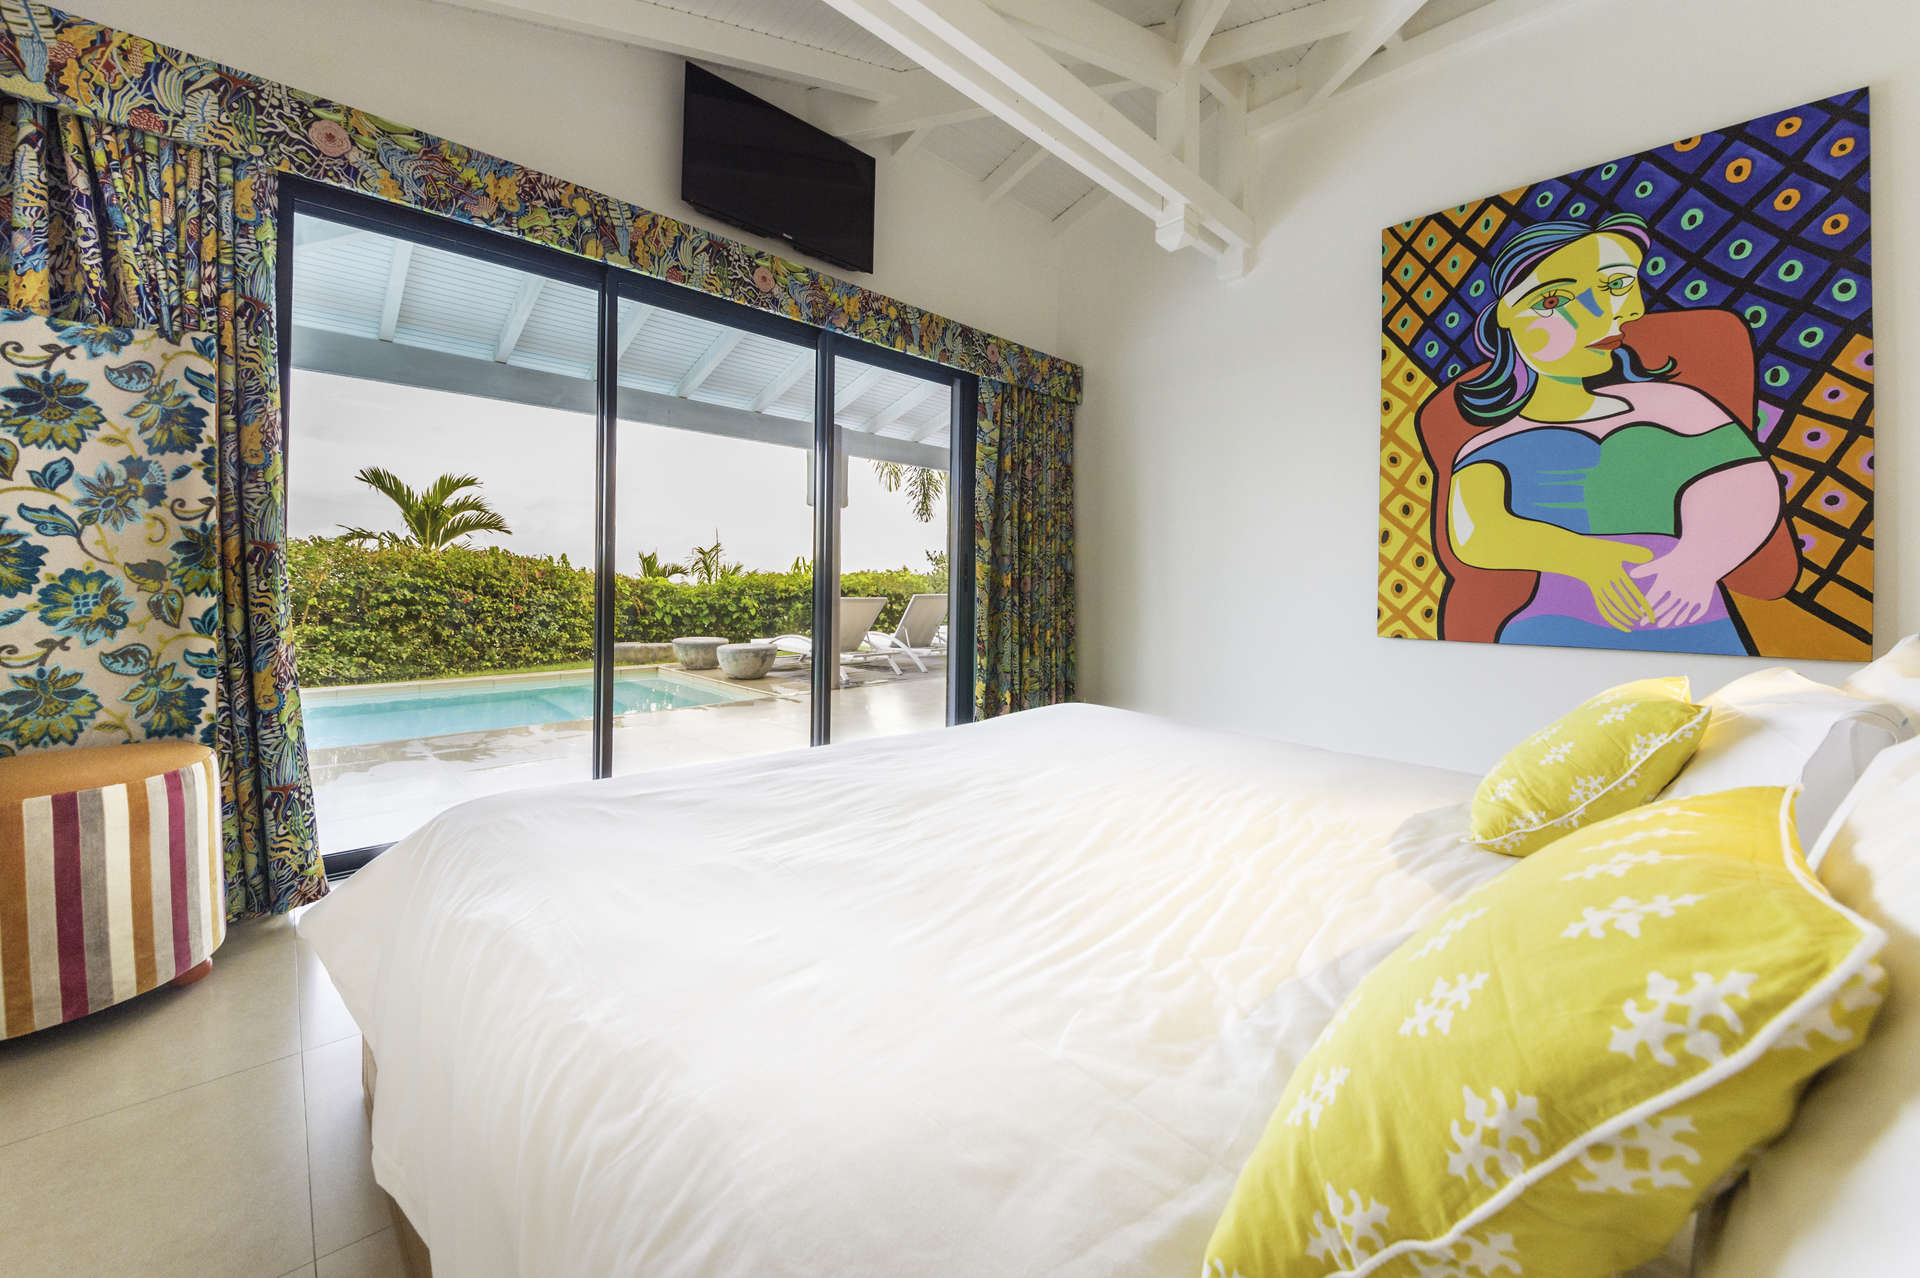 Luxury villa rentals caribbean - Guadeloupe - La toubana hotel and spa - No location 4 - Patio Suites - Image 1/5